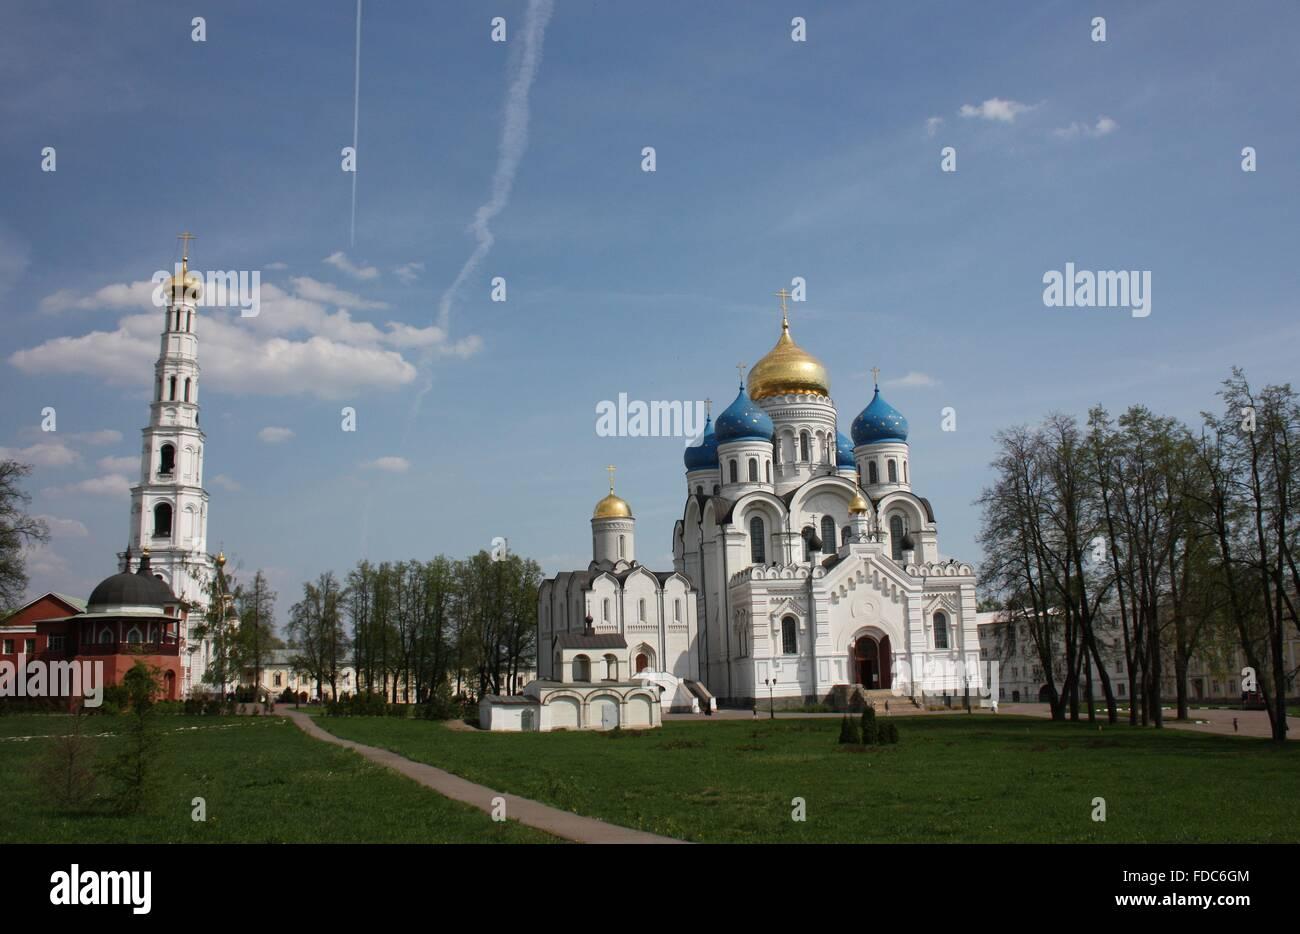 Panorama of St. Nicholas Ugreshsky monastery. Russia, Moscow region, Dzerzhinsky - Stock Image